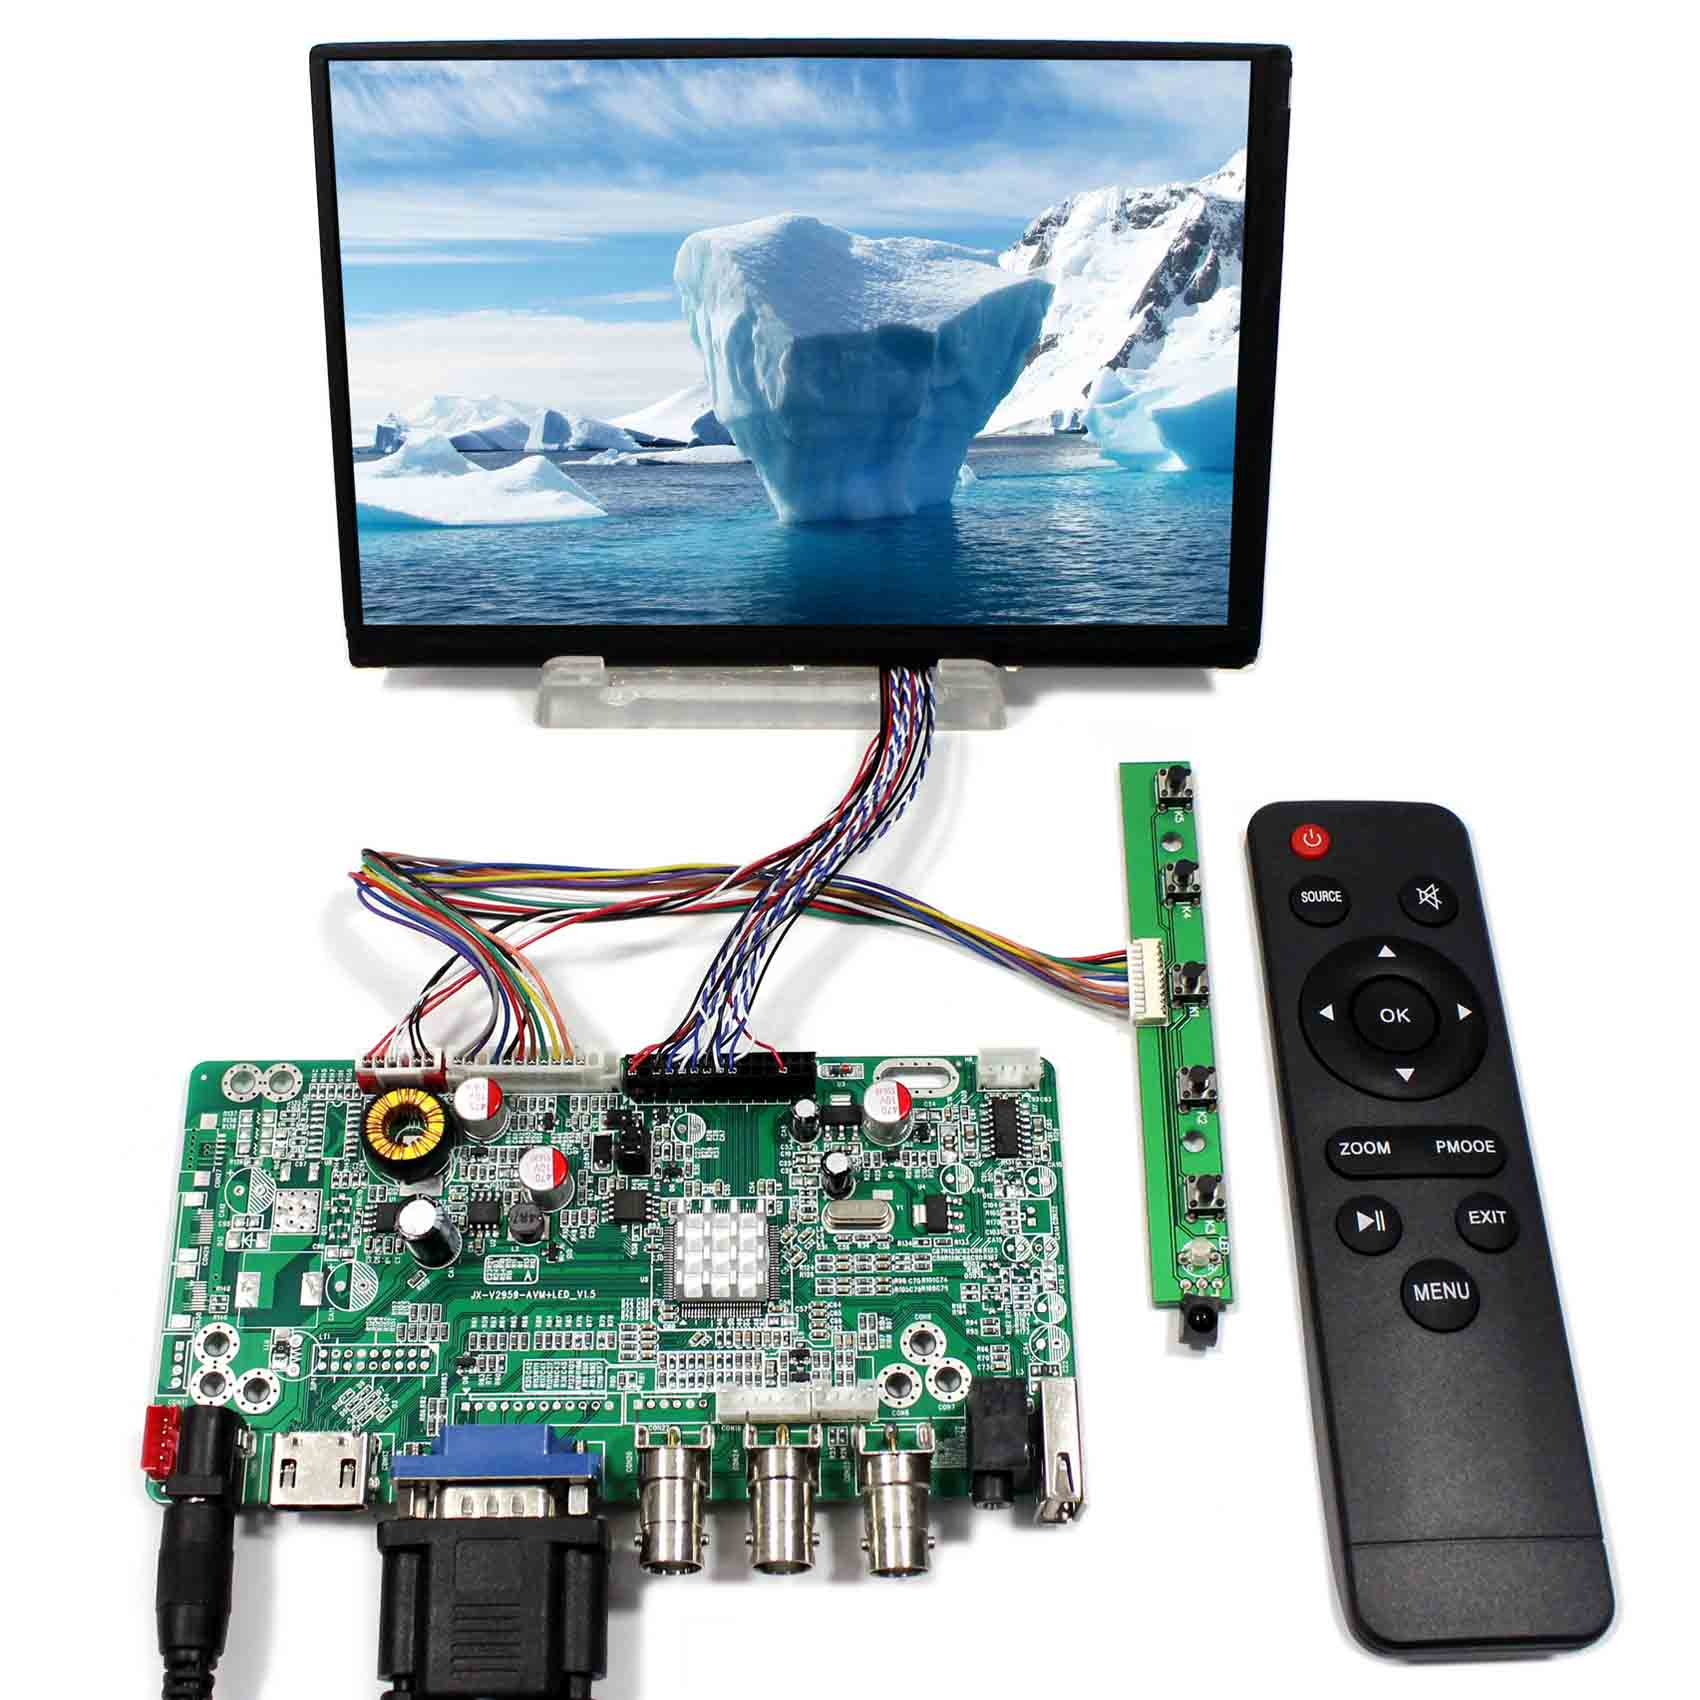 HDMI VGA BNC USB Audio LCD controller board JX-V2959-AVM with 7inch N070ICG-LD1 1280x800 IPS lcd panelHDMI VGA BNC USB Audio LCD controller board JX-V2959-AVM with 7inch N070ICG-LD1 1280x800 IPS lcd panel